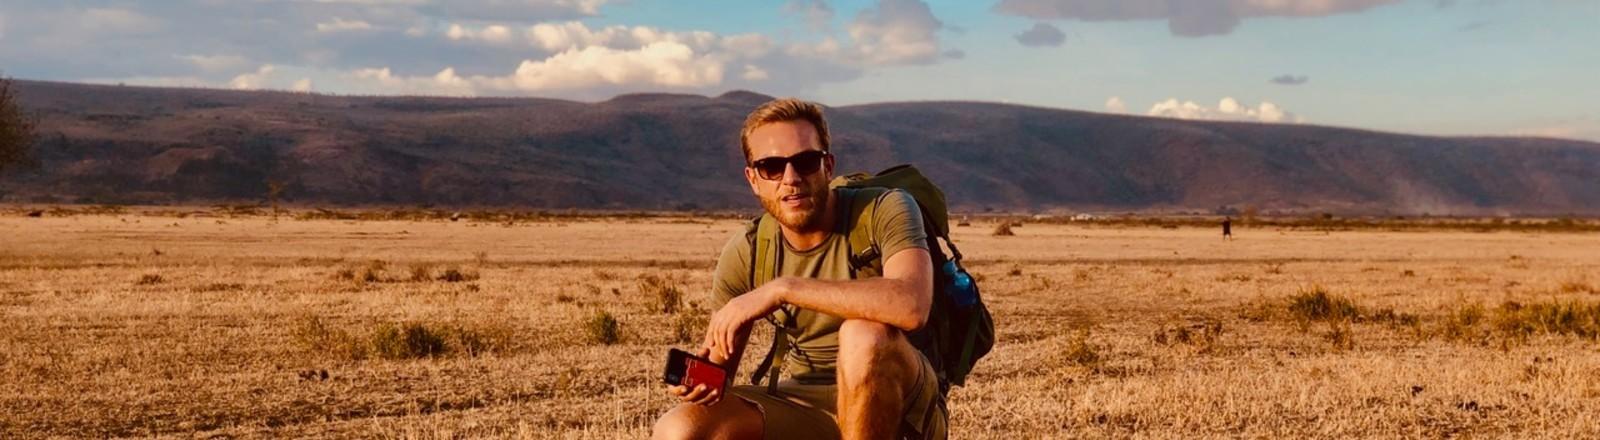 Gunnar Oberhösel in Afrika.